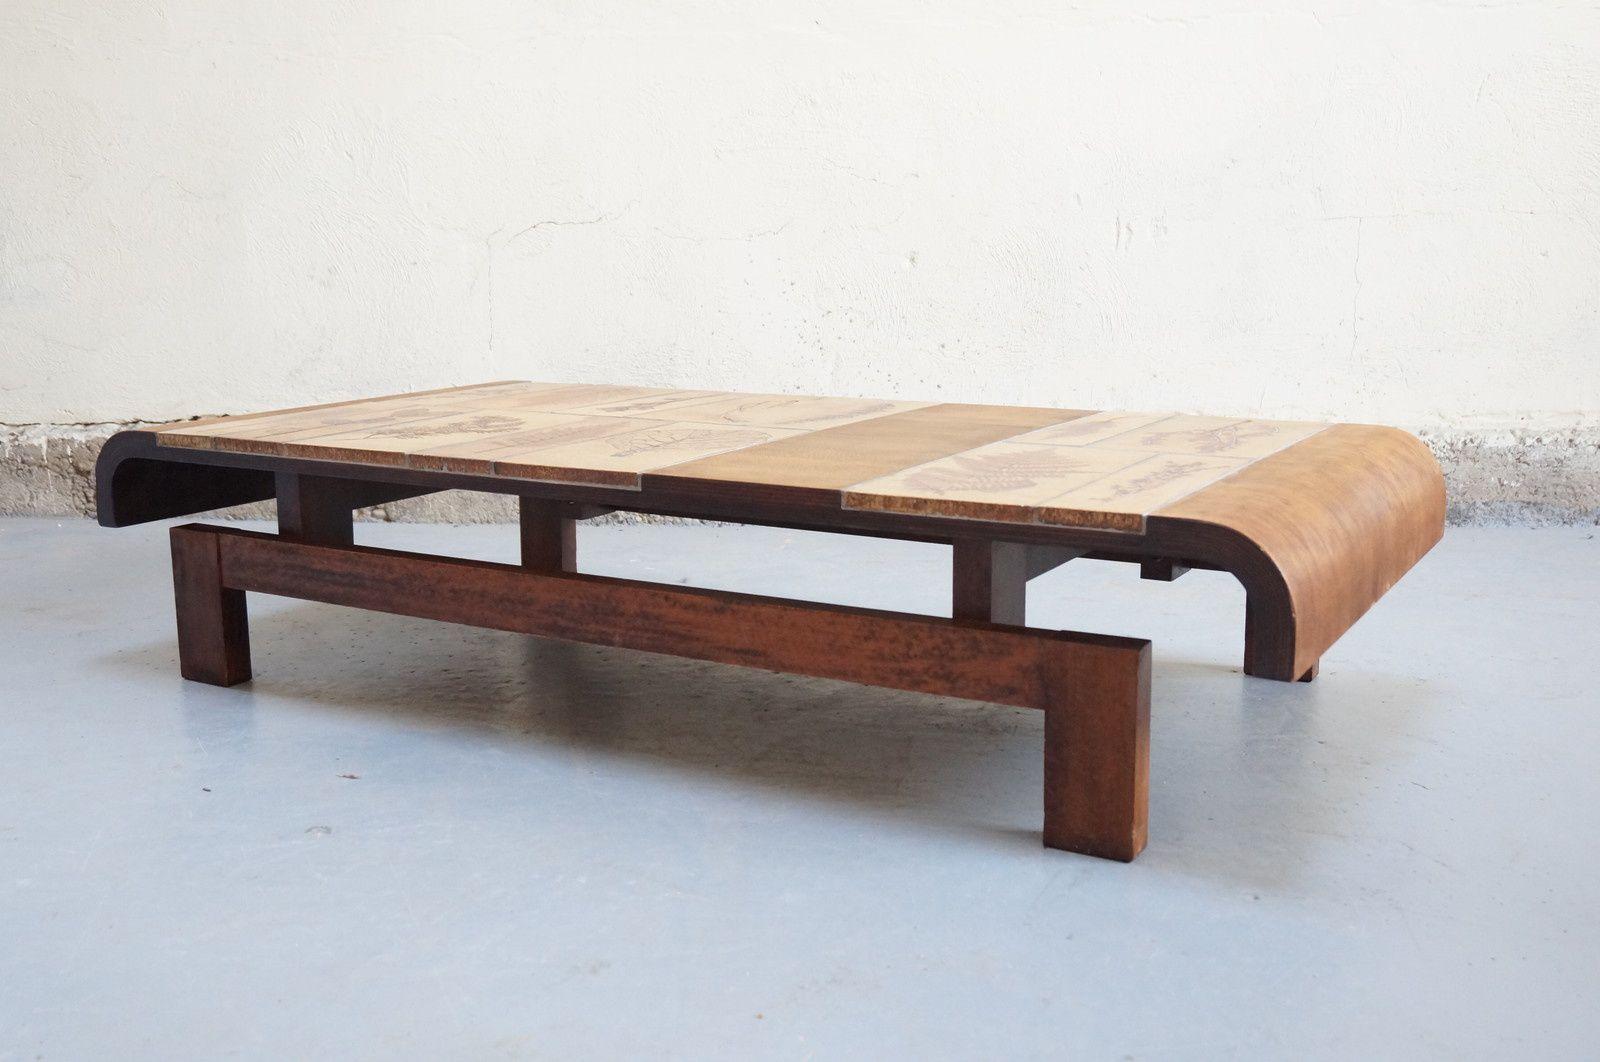 table basse capron roger design vintage ceramique ann es 50 60 70 contre plaqu emiellabroc. Black Bedroom Furniture Sets. Home Design Ideas